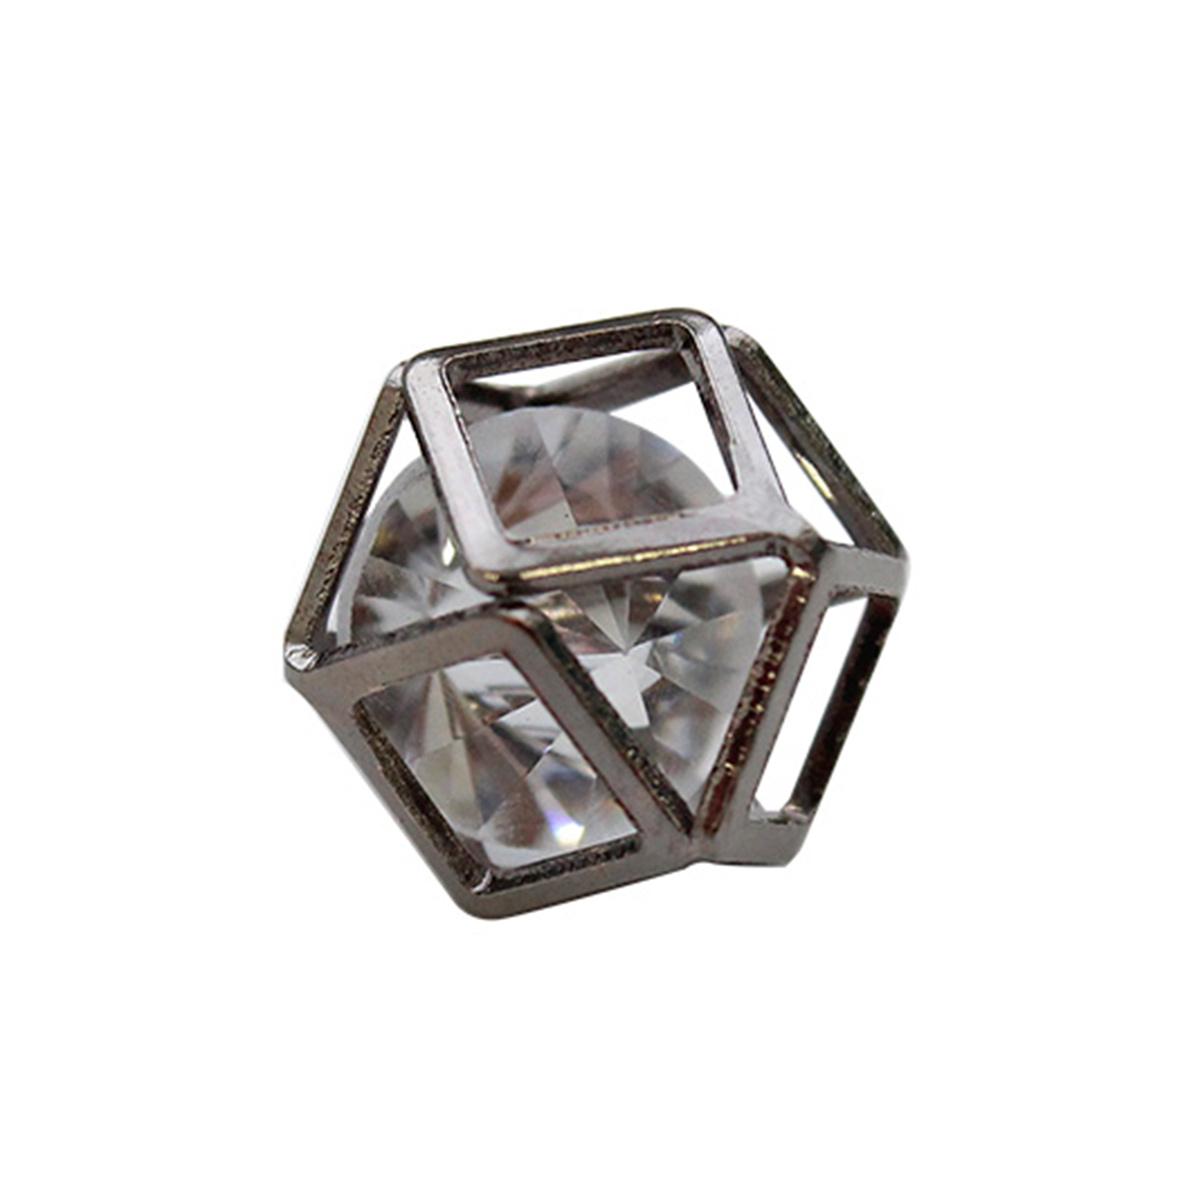 Бусина-коробочка со стразом 'Куб', 2шт/упак